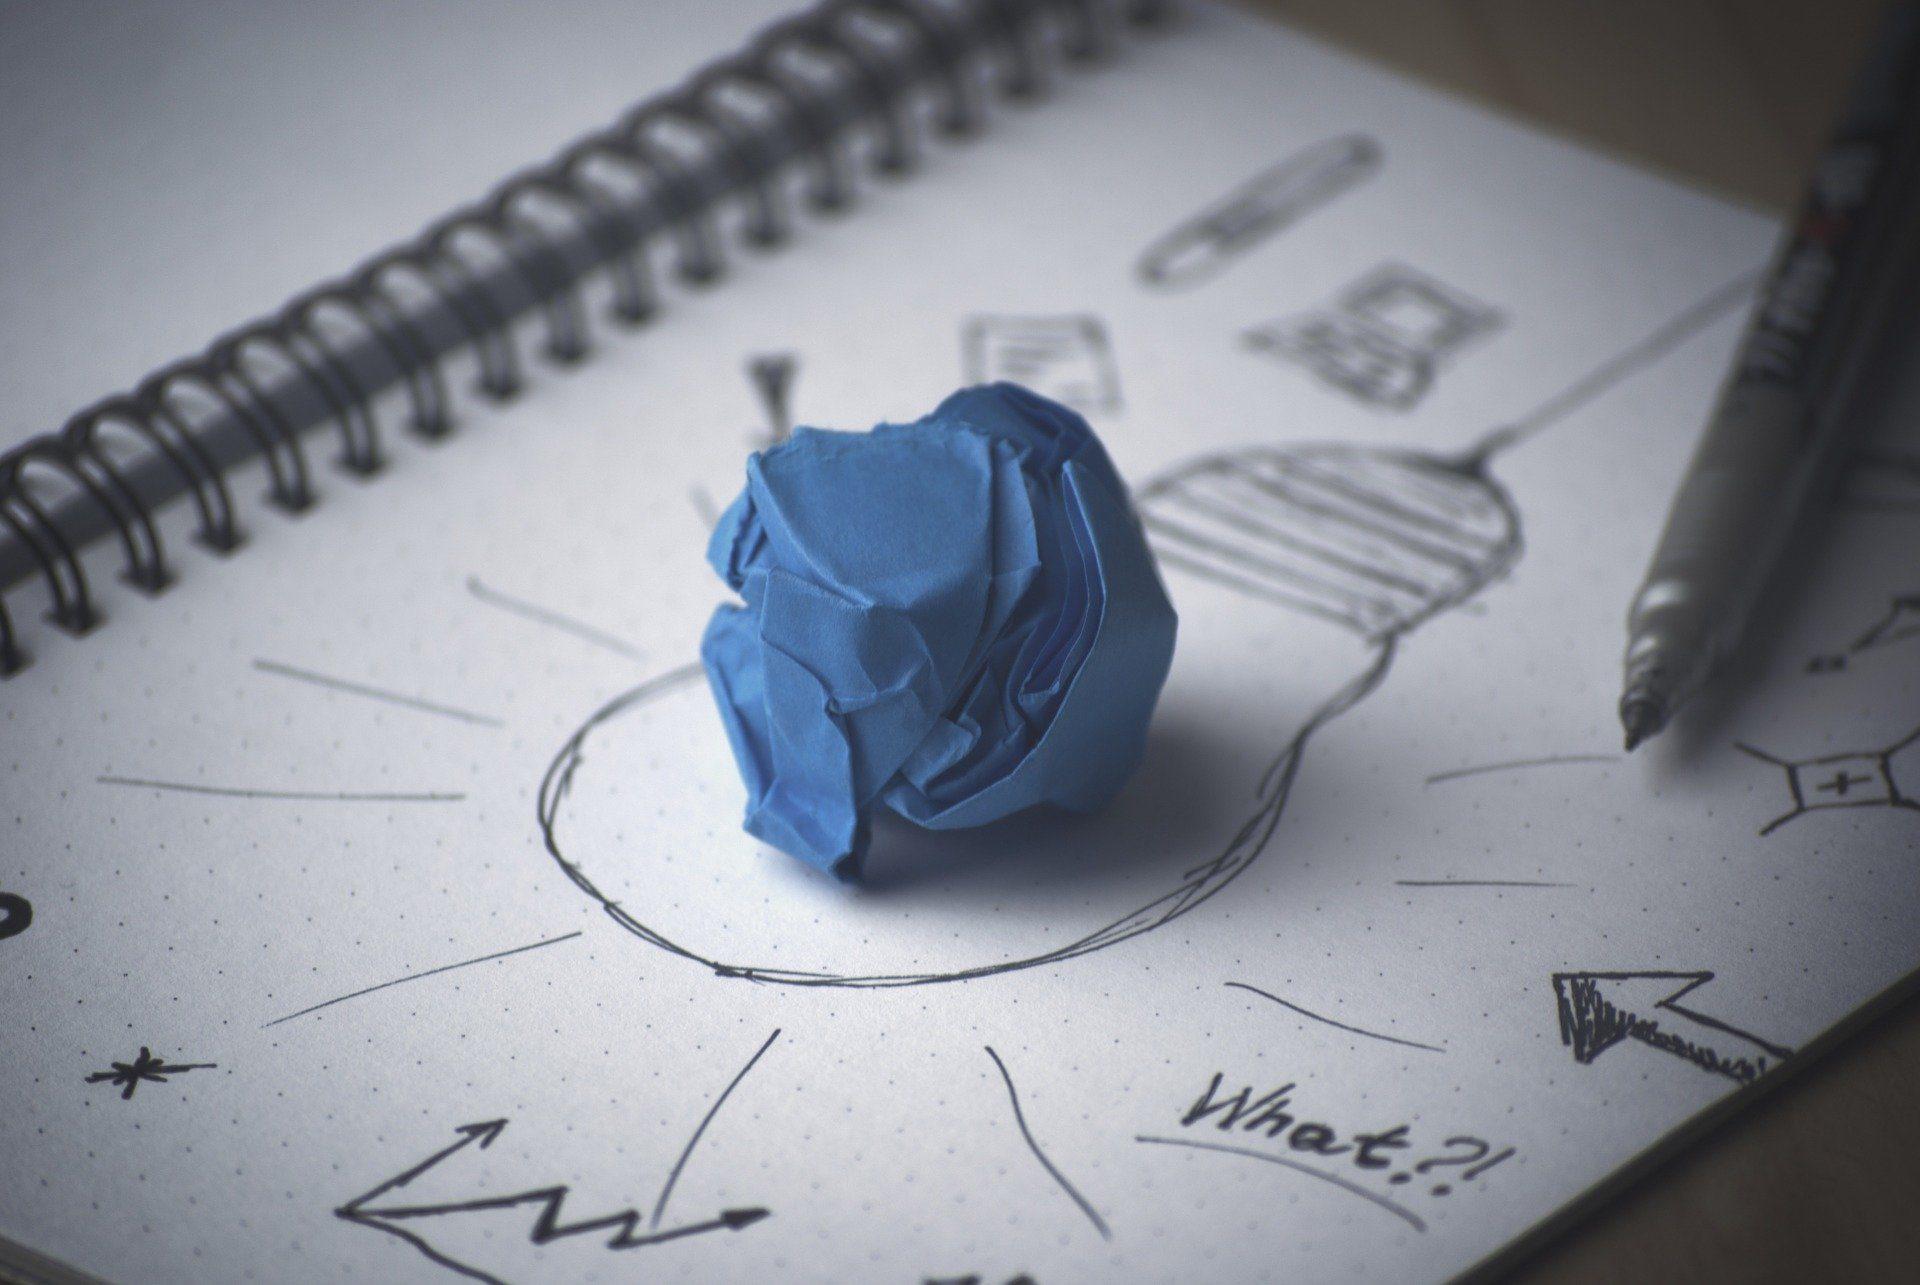 Innovatieprijs Regio Foodvalley 2021